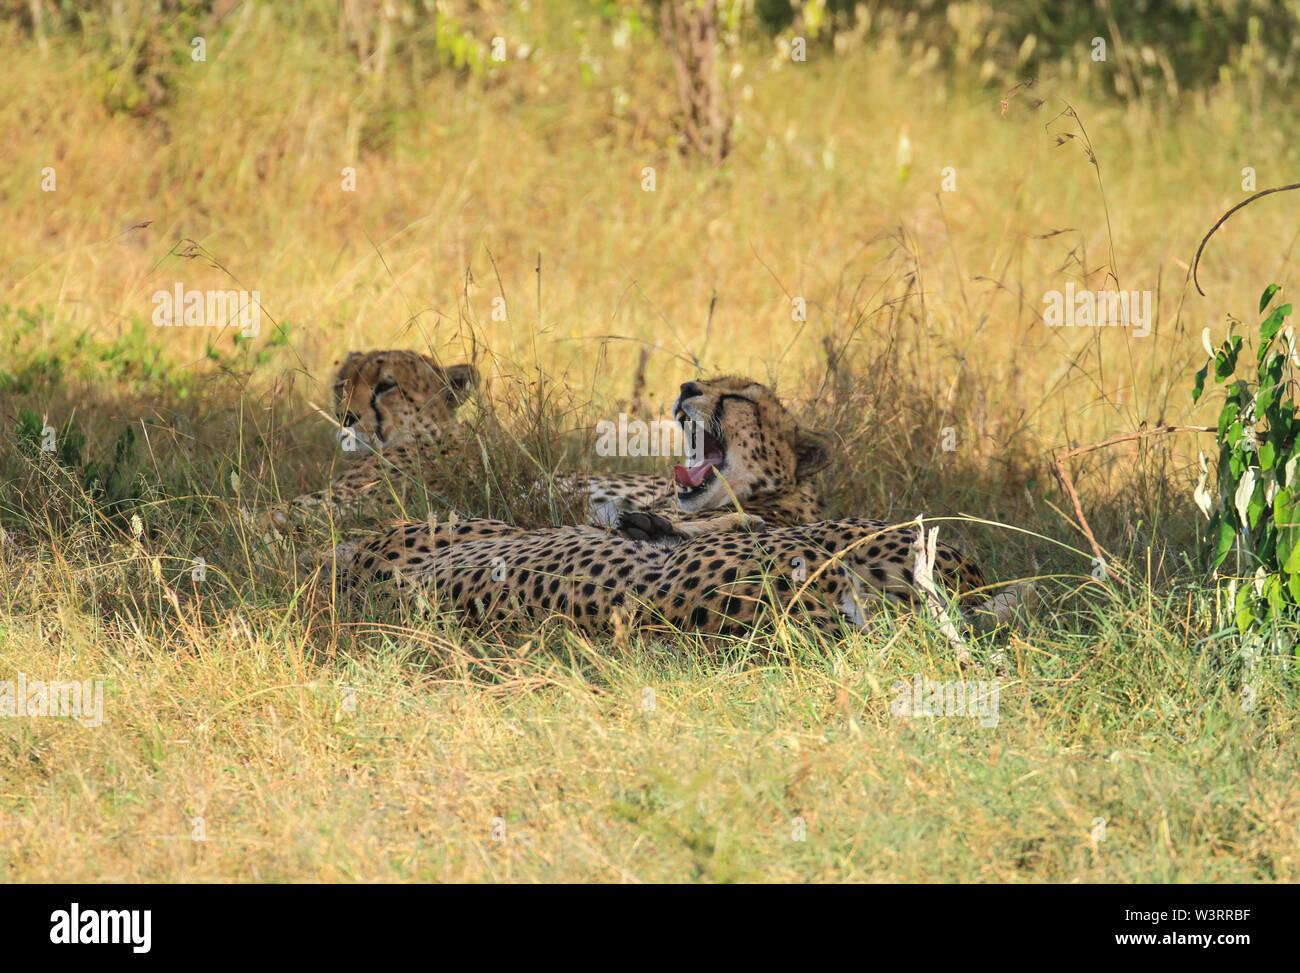 Cheetah Acinonyx jubatus three cheetahs brothers yawn yawning wide teeth tongue lying down in green yellow grass Masai Mara National Reserve copy - Stock Image